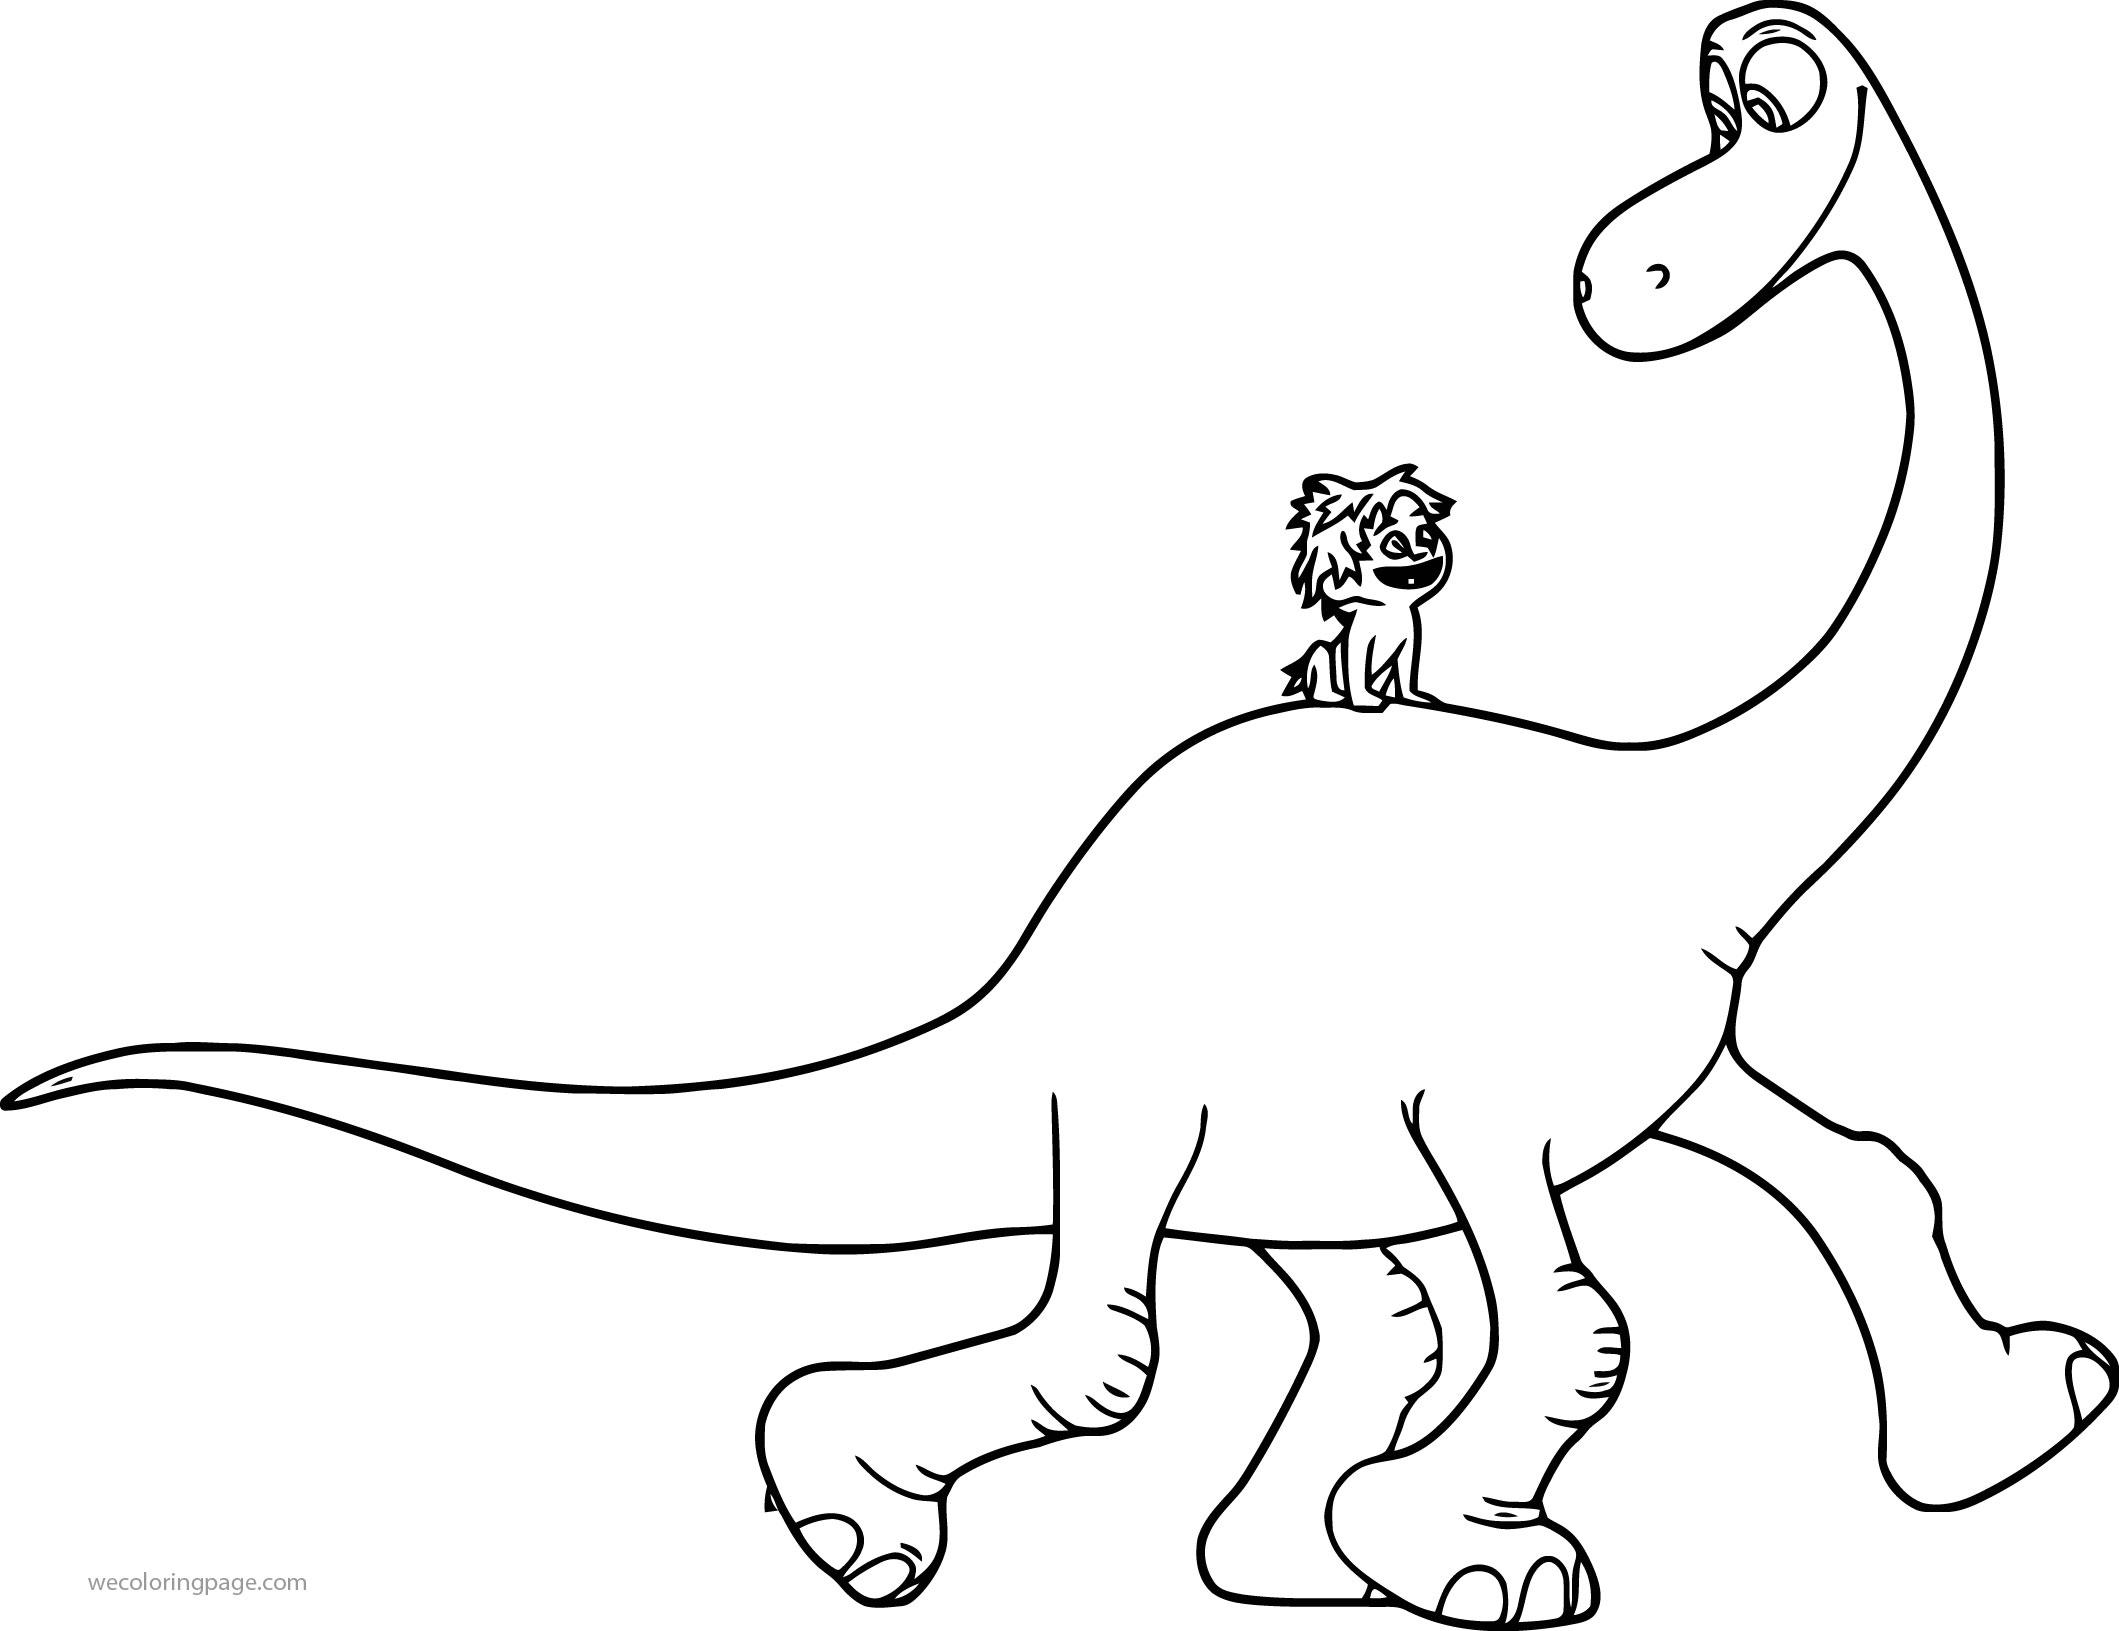 The Good Dinosaur Disney Arlo Spot Go Cartoon Coloring Pages